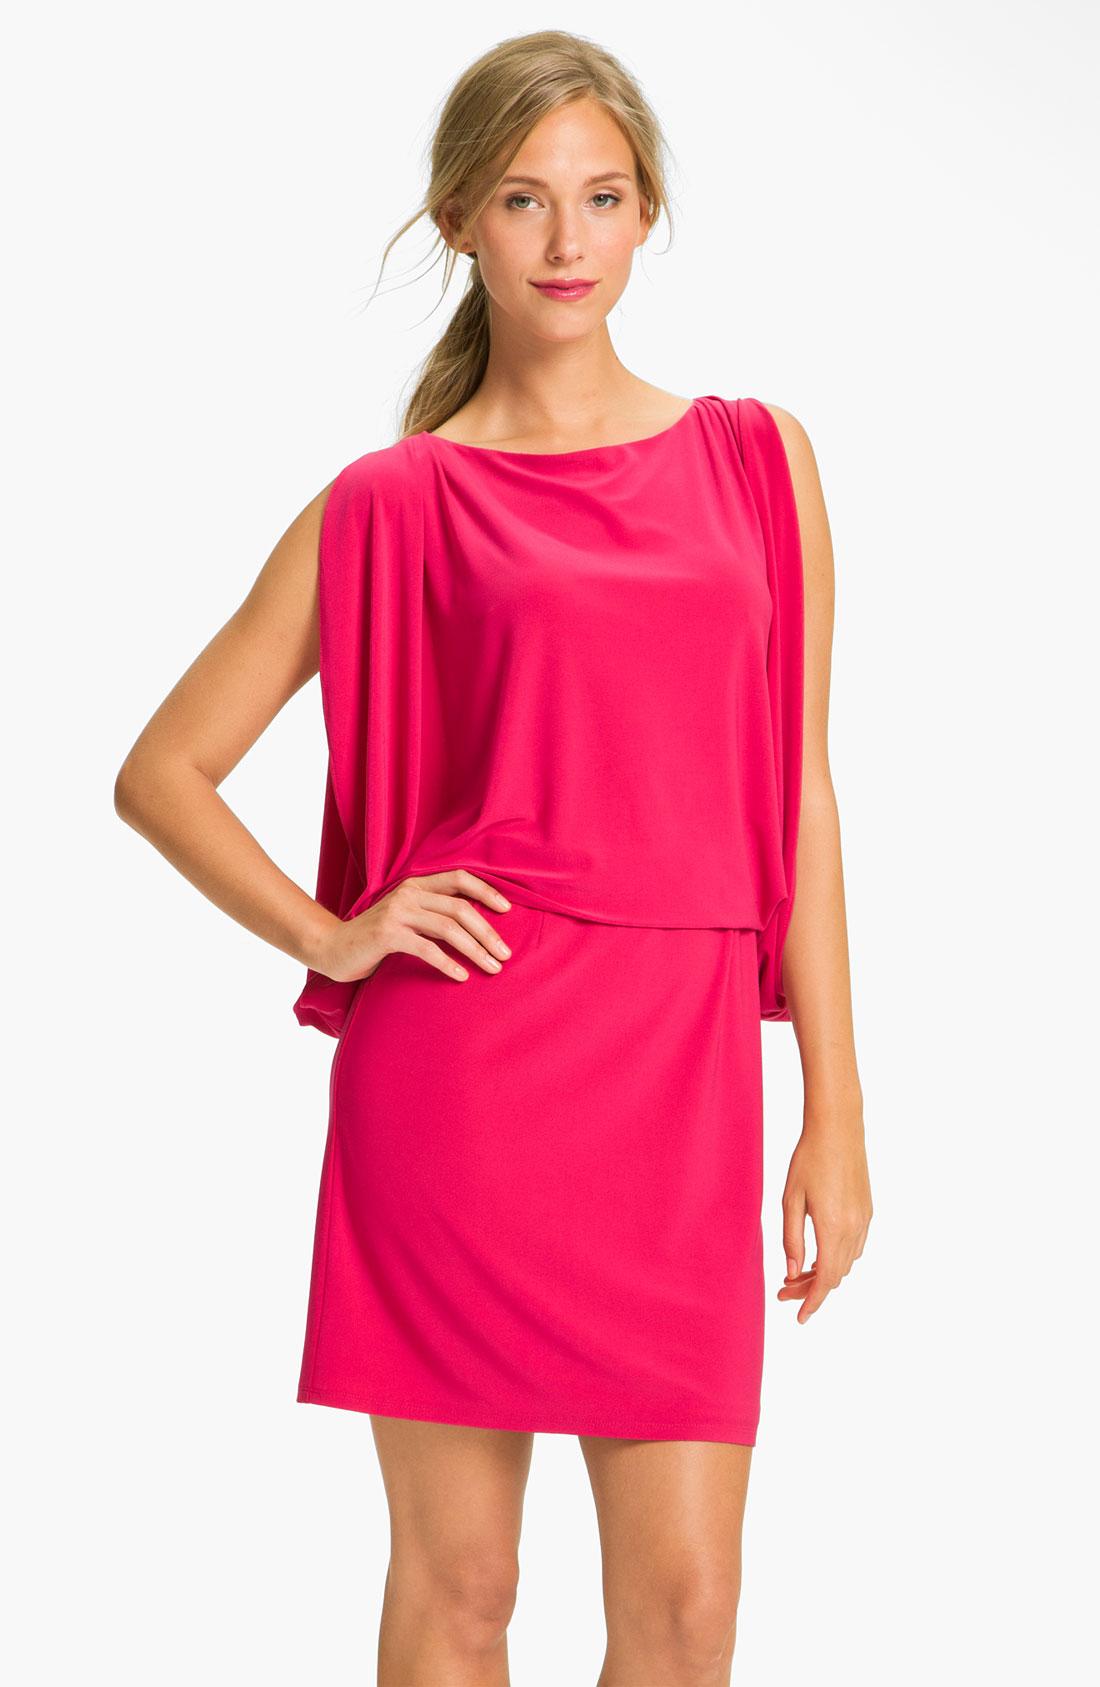 Jessica Simpson Draped Sleeve Jersey Blouson Dress In Pink